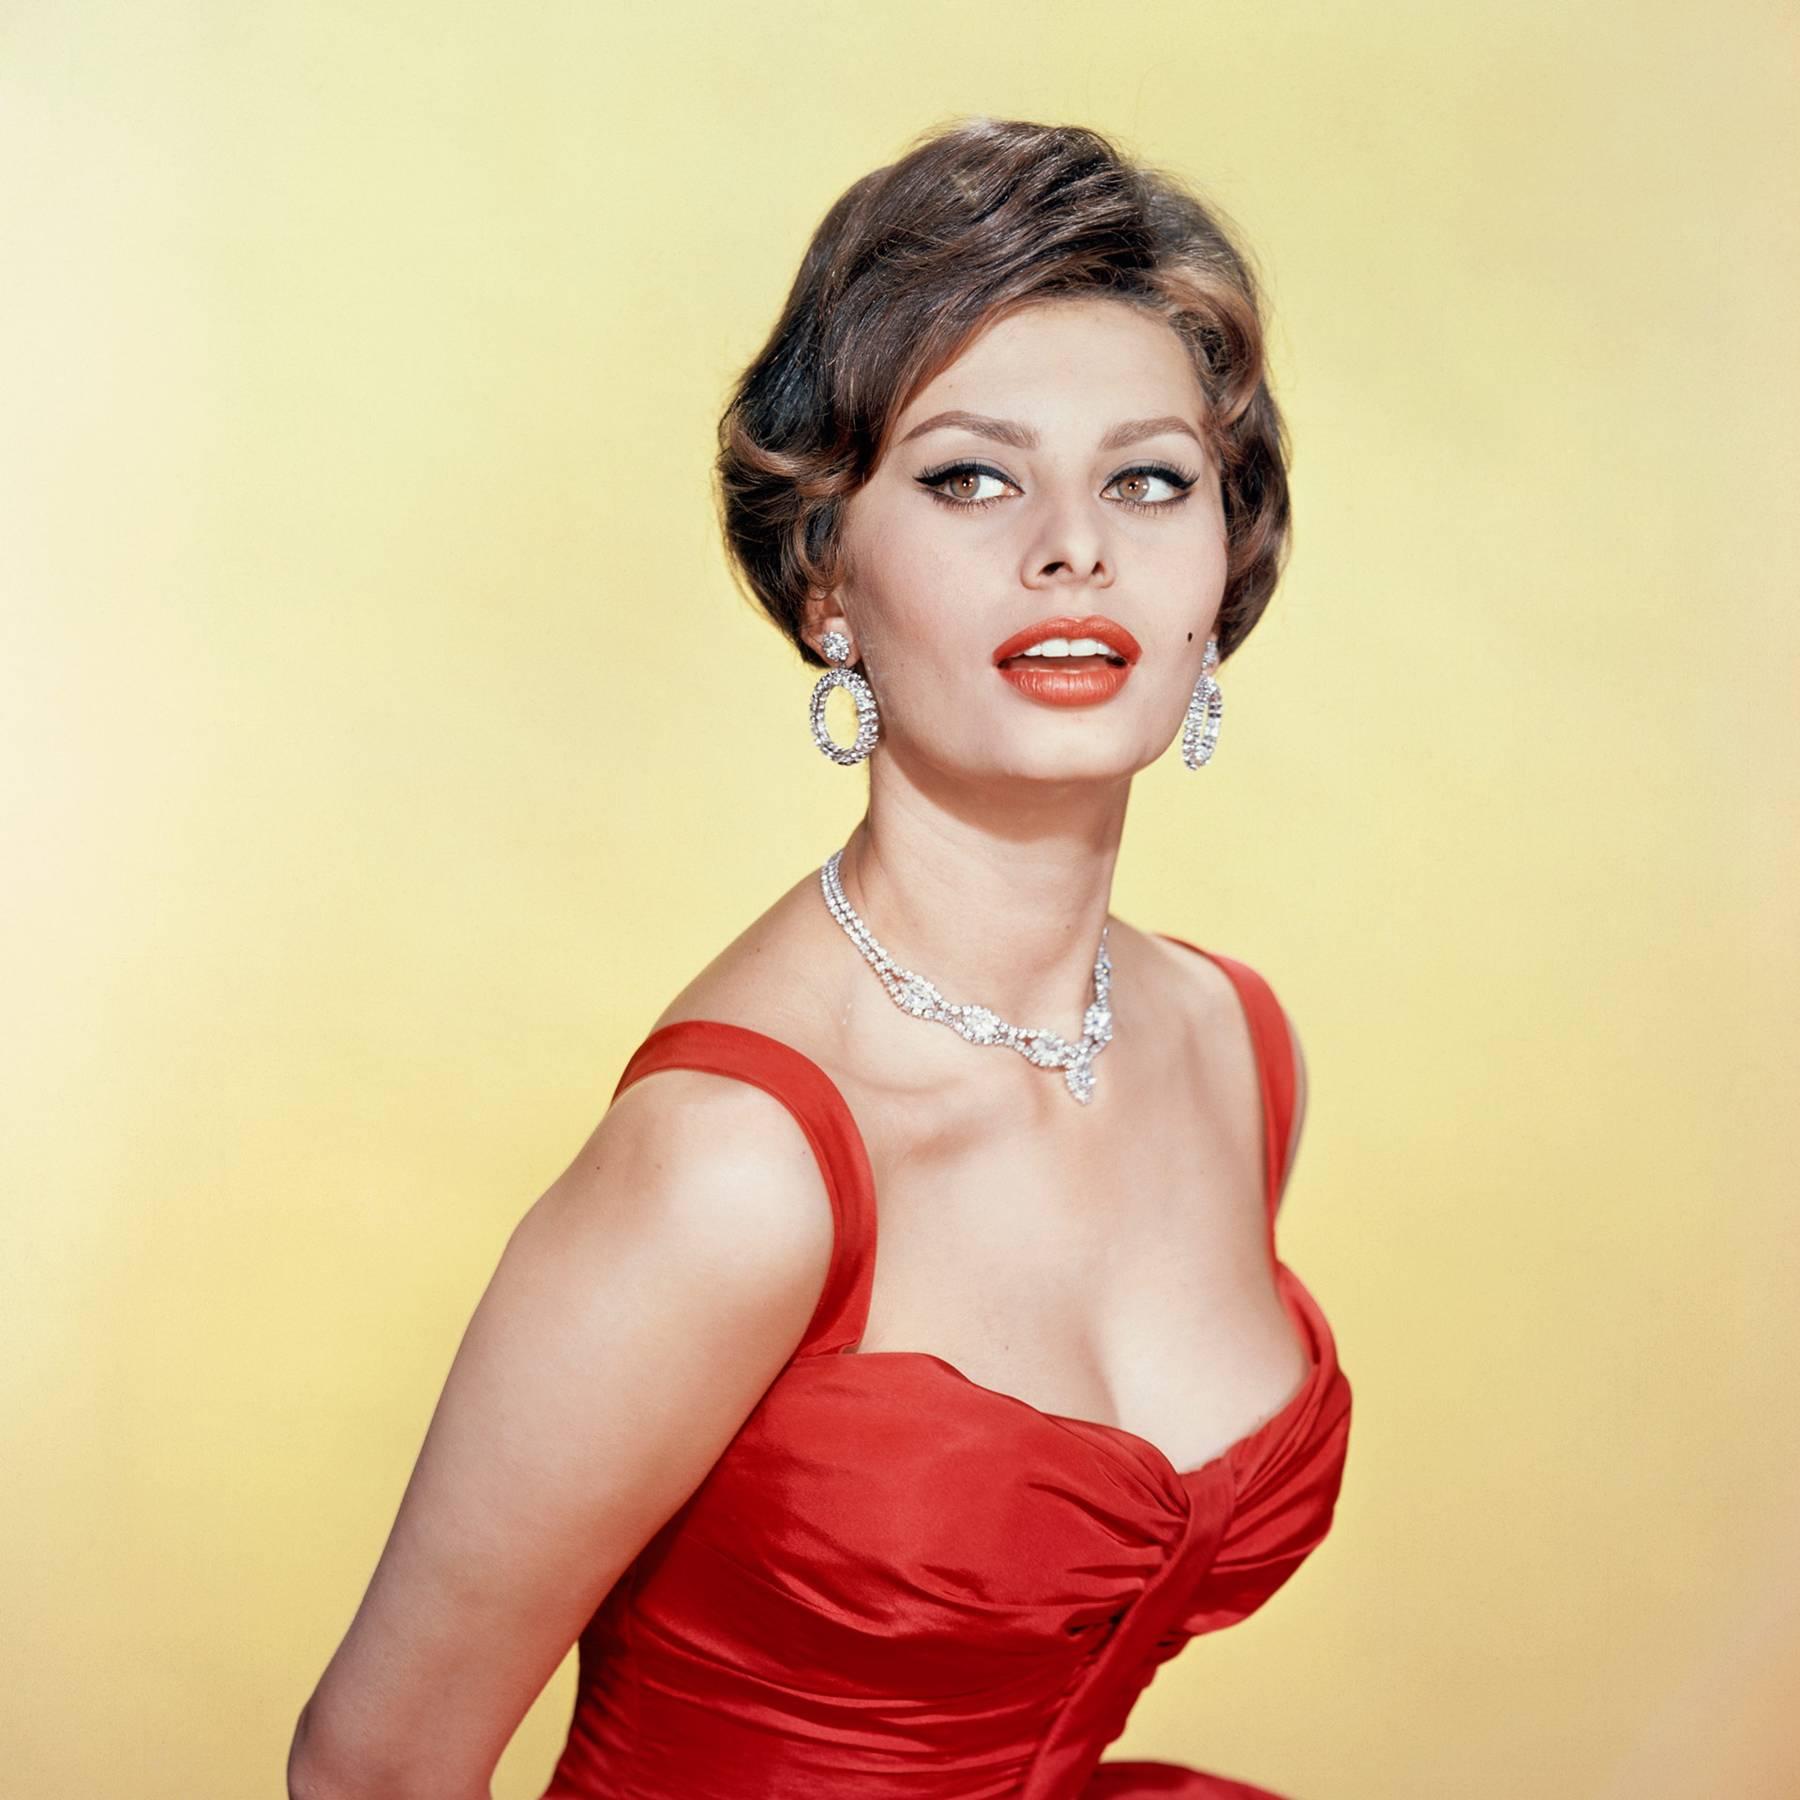 Sophia Loren The Life Ahead New Film Awards Season Oldest Oscar Nominee Tatler